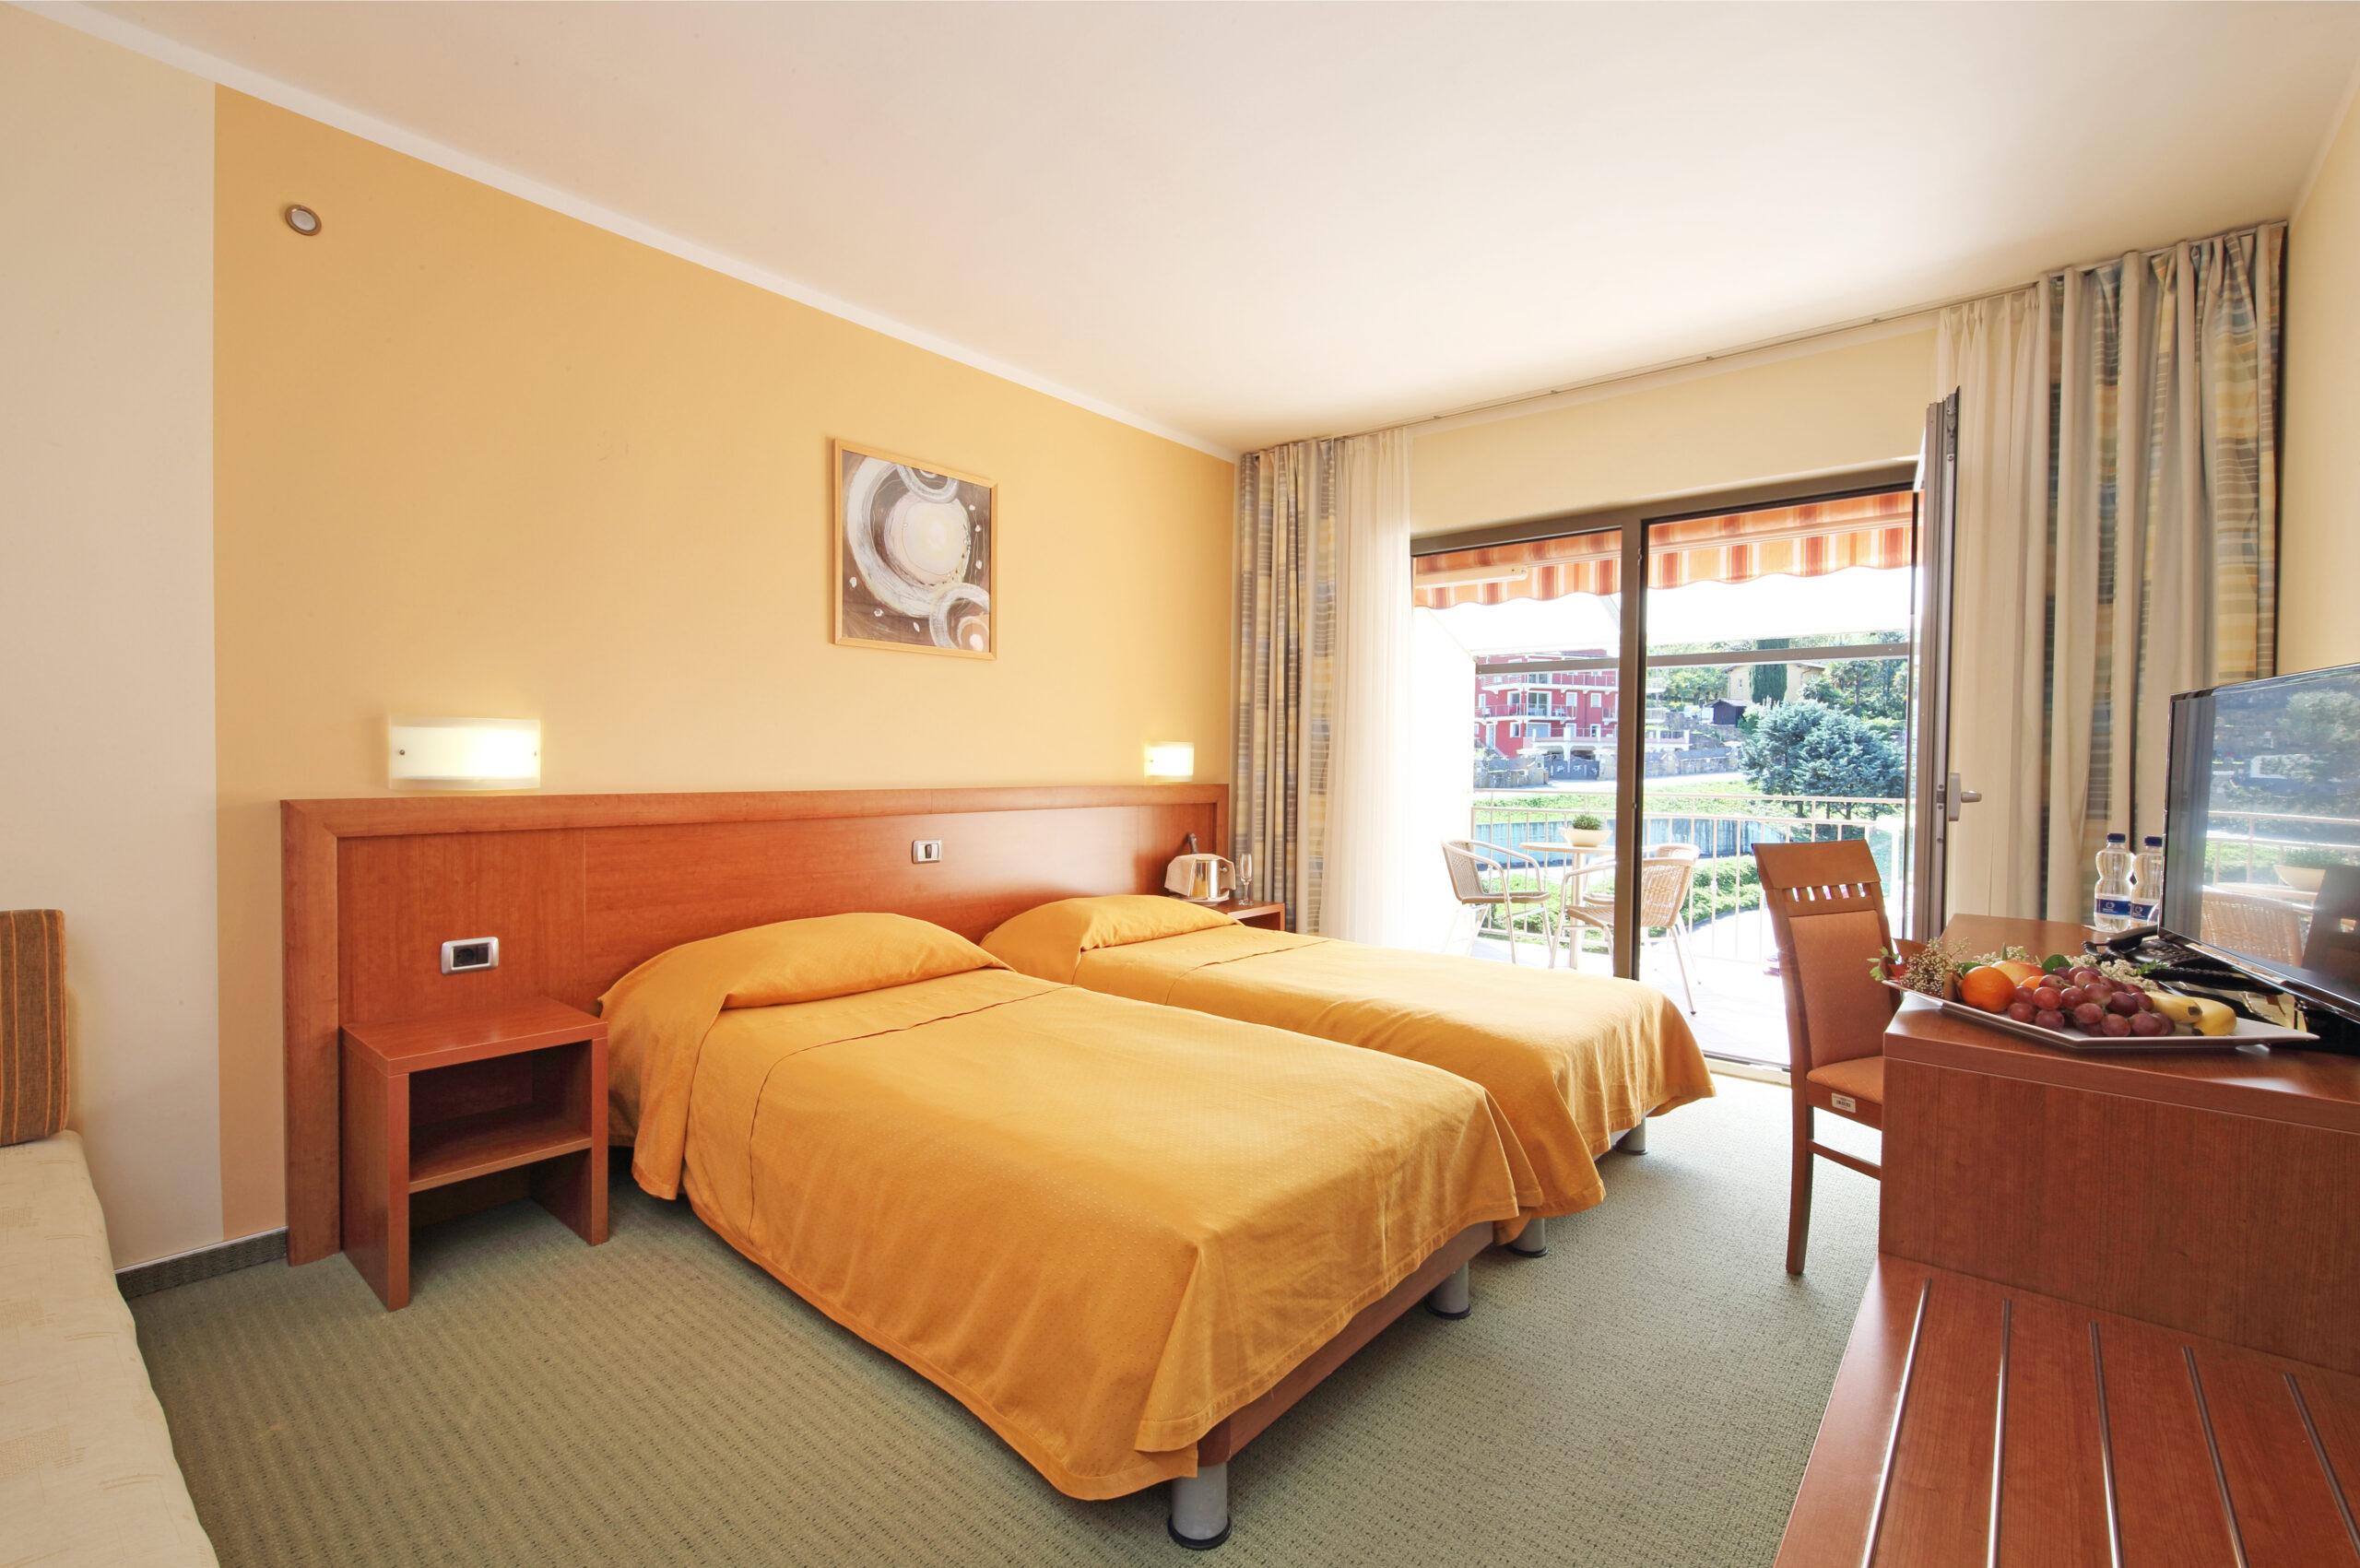 Salinera twin room